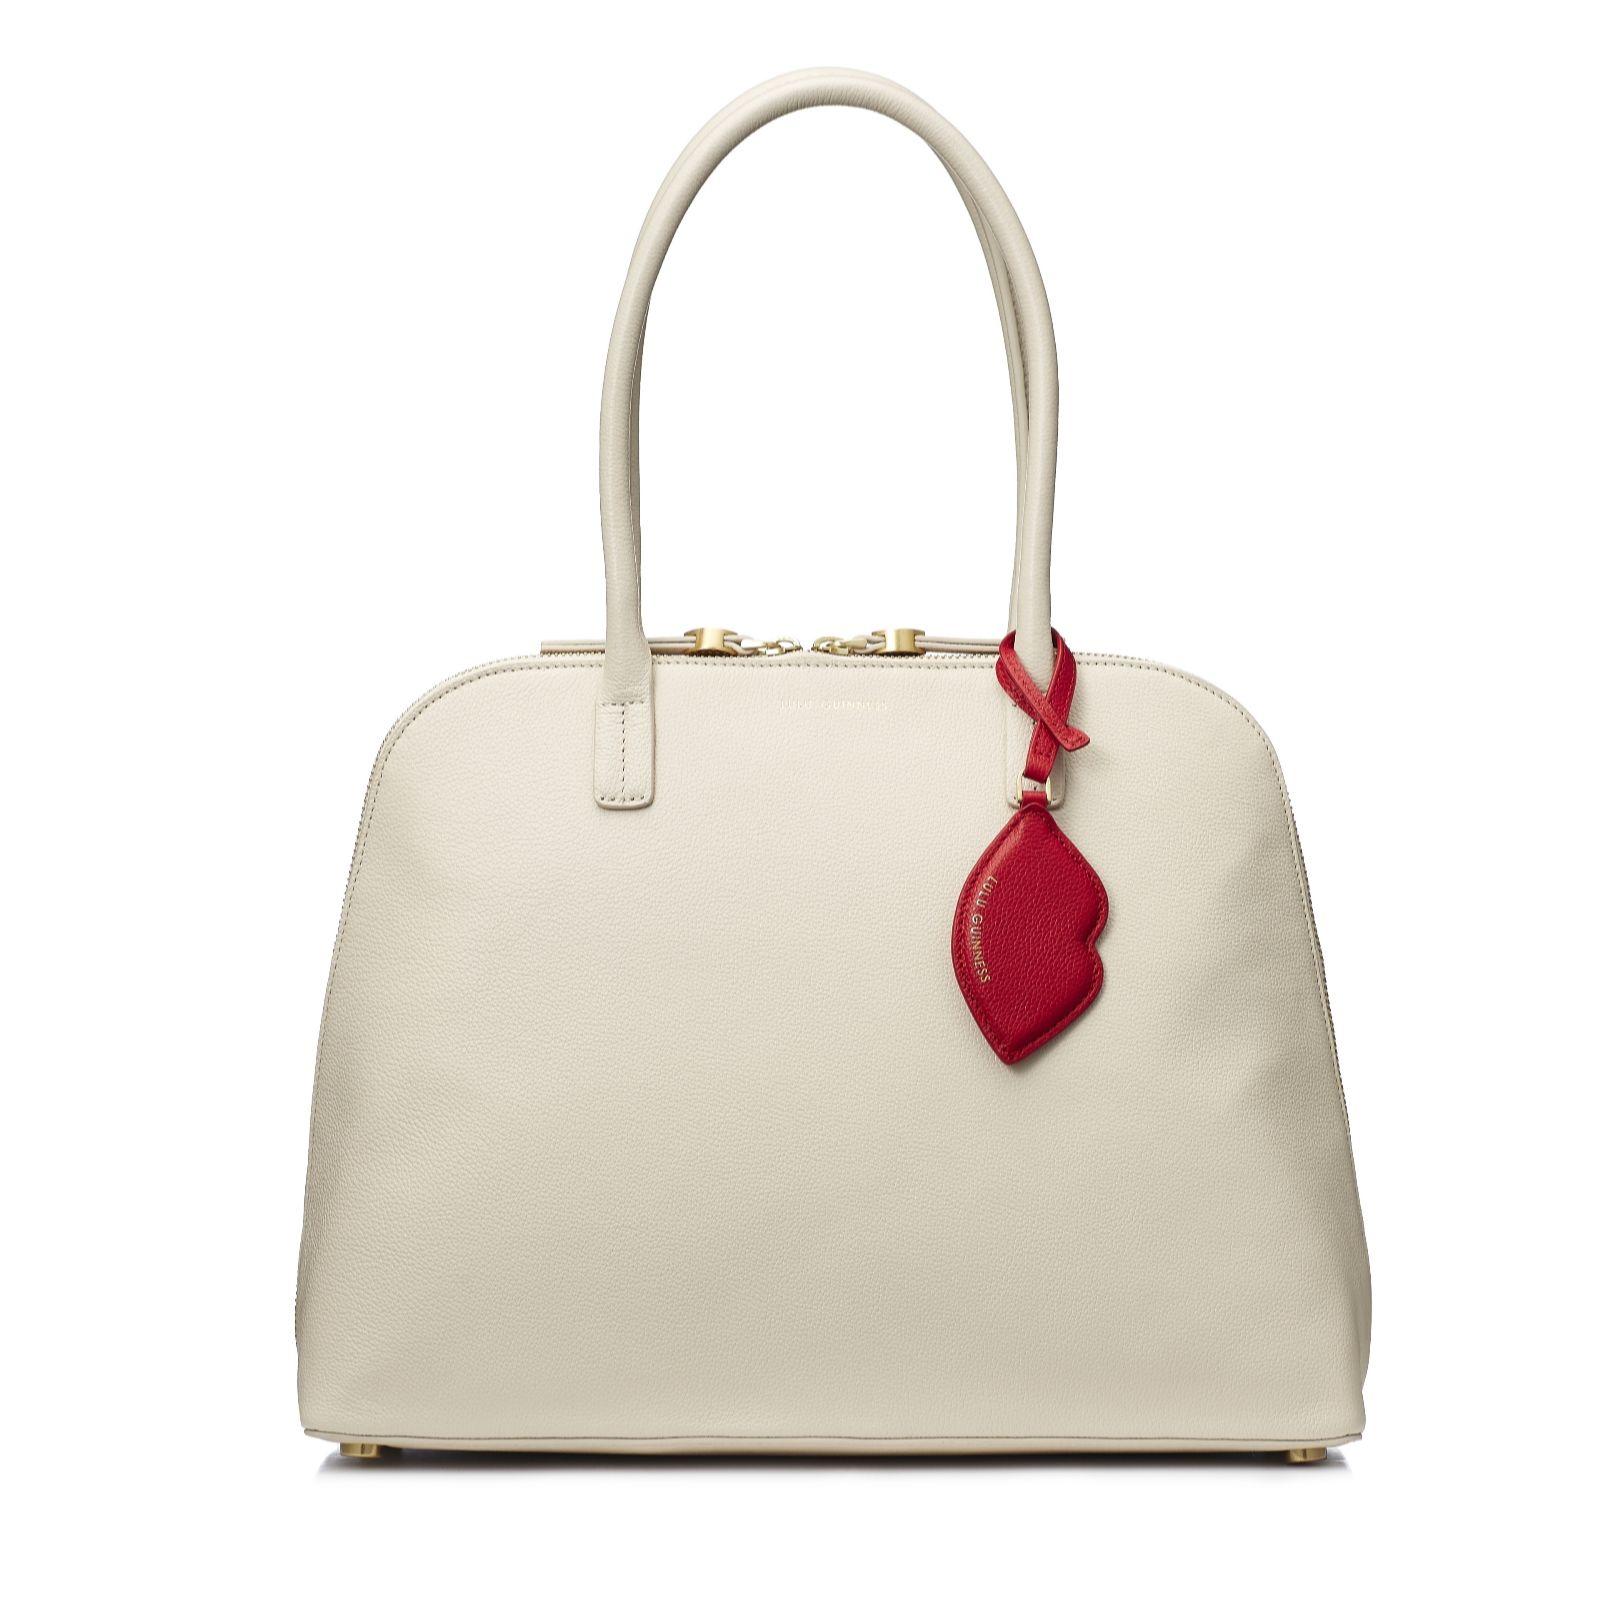 48d80861bc656 Lulu Guinness Bobbi Large Leather Shoulder Bag with Charm - QVC UK